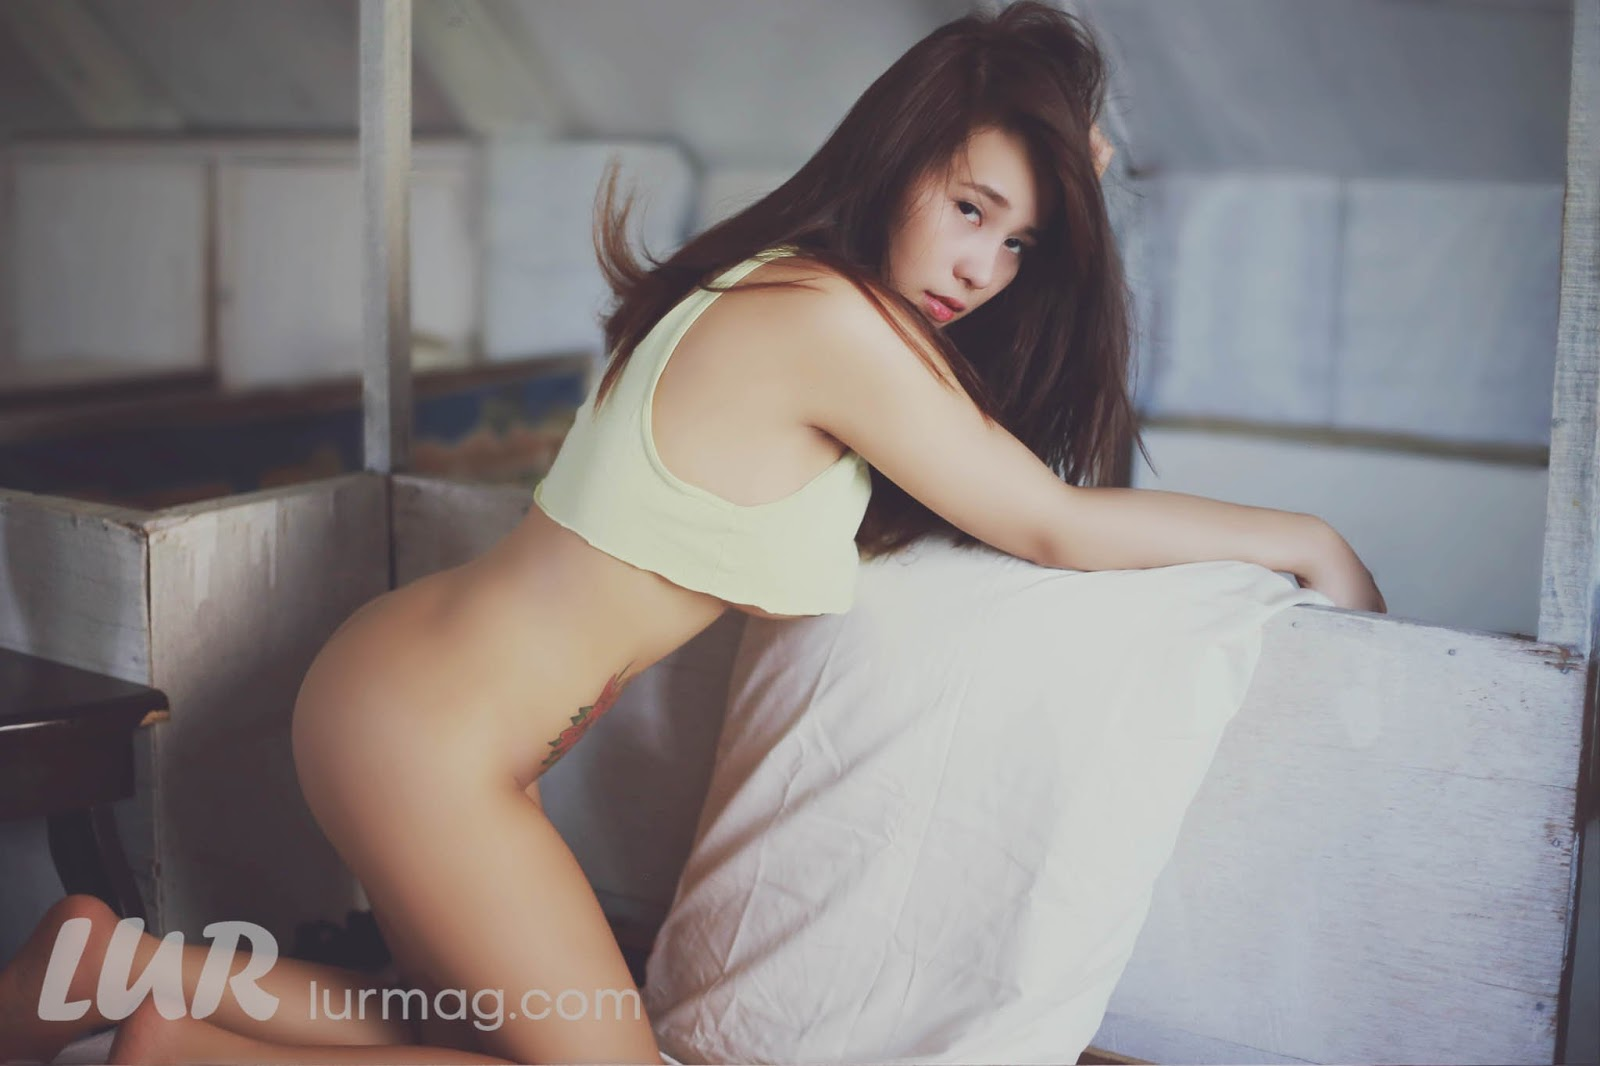 Elaiza Cae Jayden Volume 1 - Uncensored